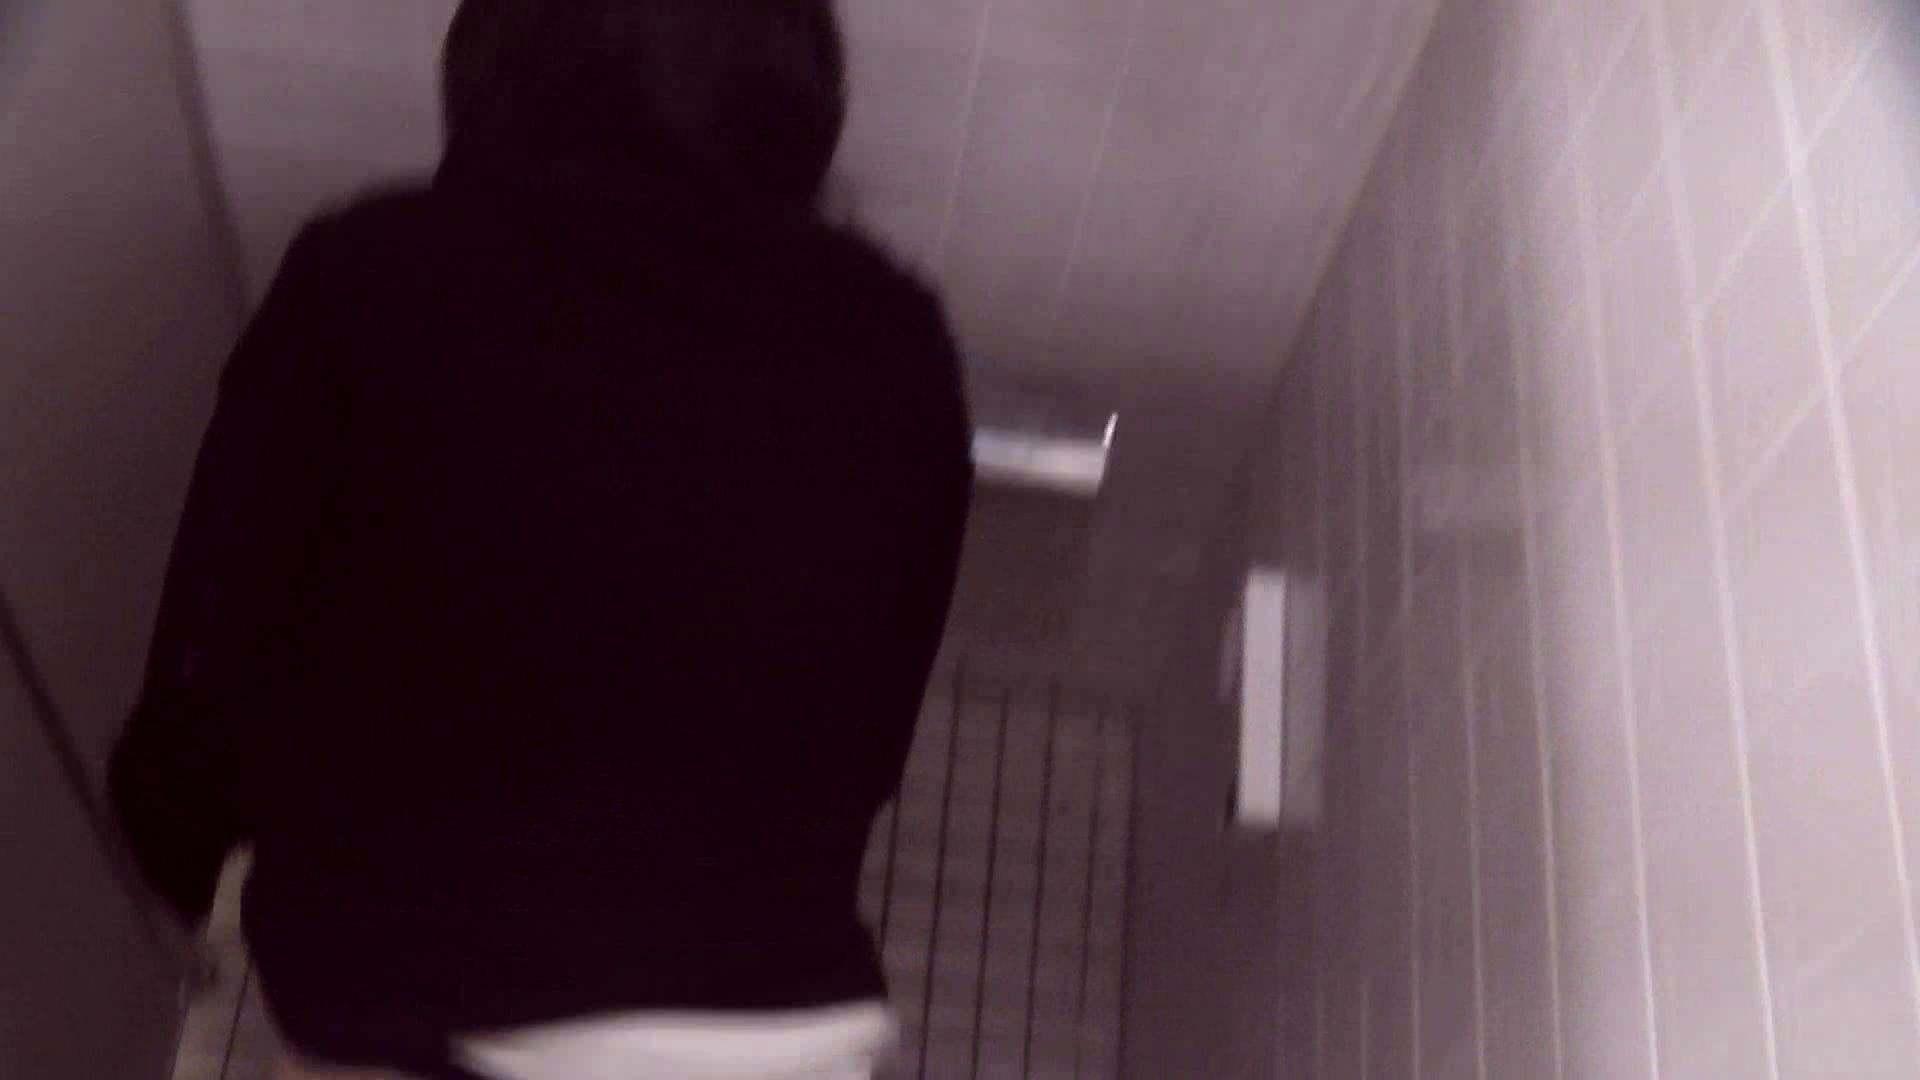 vol.17 命がけ潜伏洗面所! 張り裂けんばかりの大物 潜入突撃 セックス画像 88pic 34